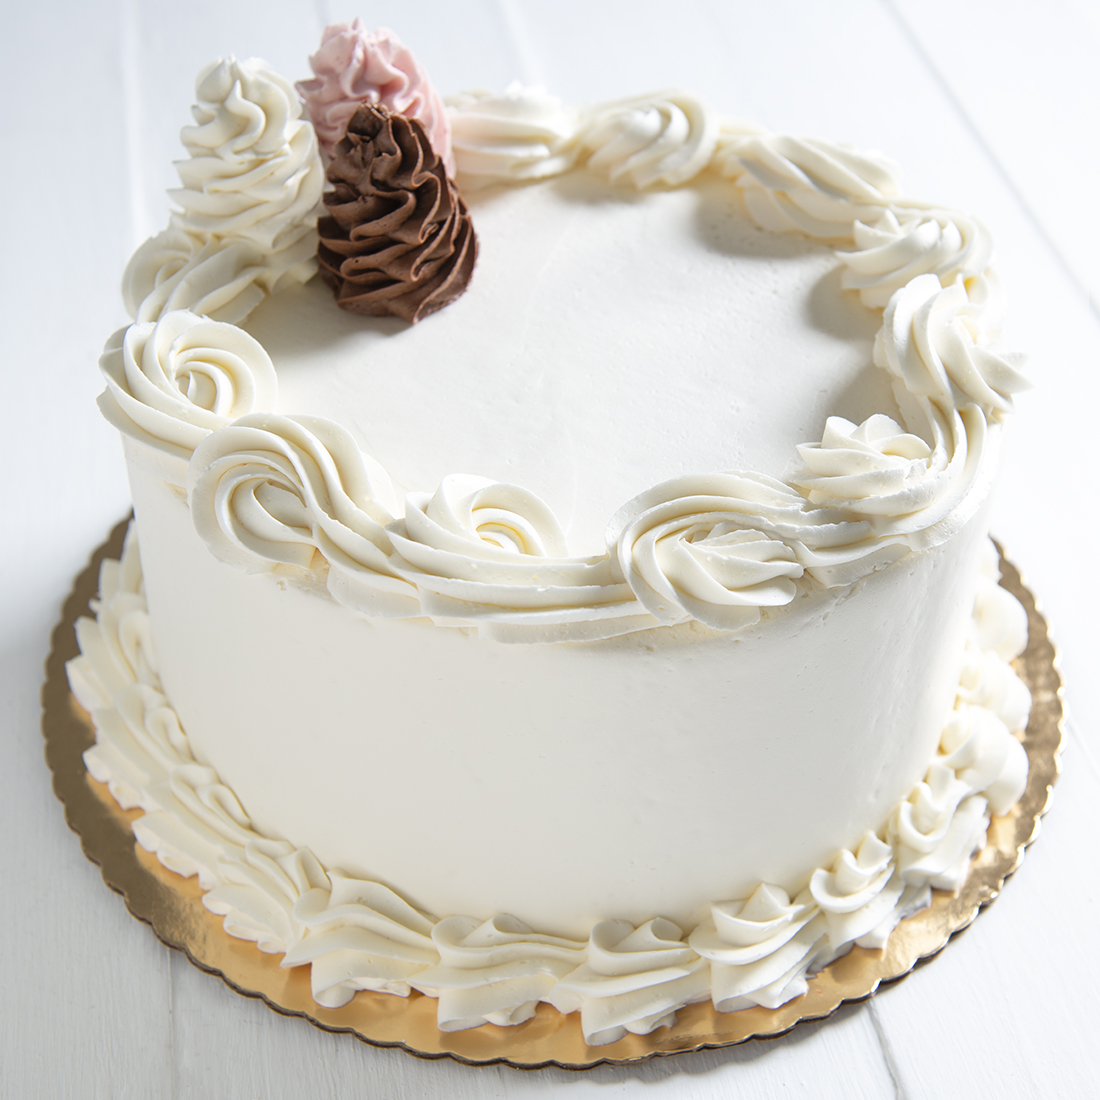 Neapolitan - One layer each of chocolate, vanilla & strawberry cake layered with chocolate & strawberry buttercream, vanilla buttercream frosting6